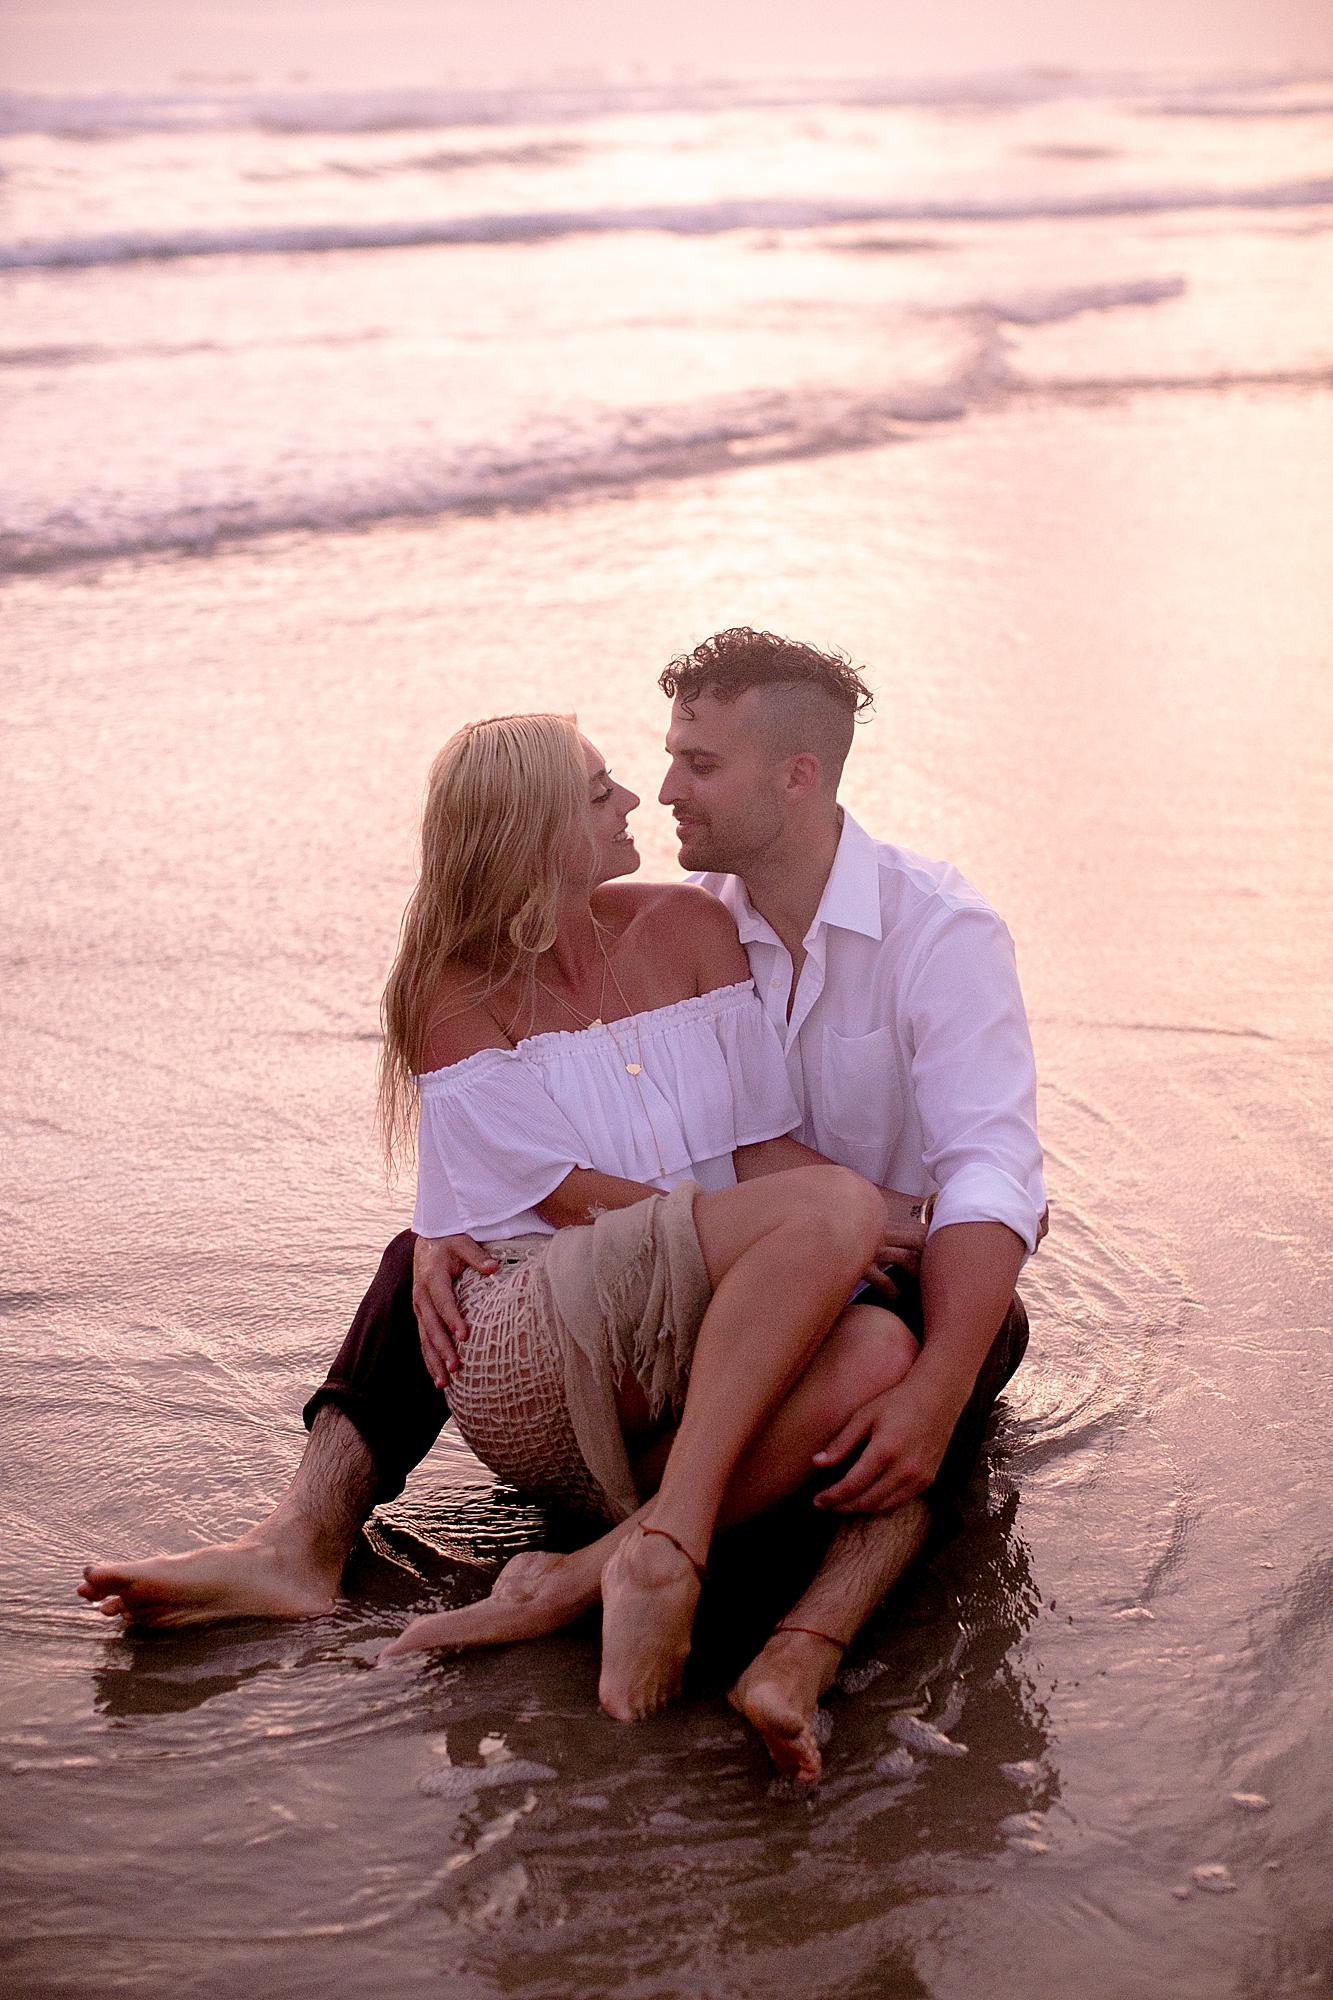 Epic and Adventurous Travel Wedding and Portrait Photographer in Nosara, Costa Rica - Kelee Bovelle @xokelee @keleeb - 20.jpg